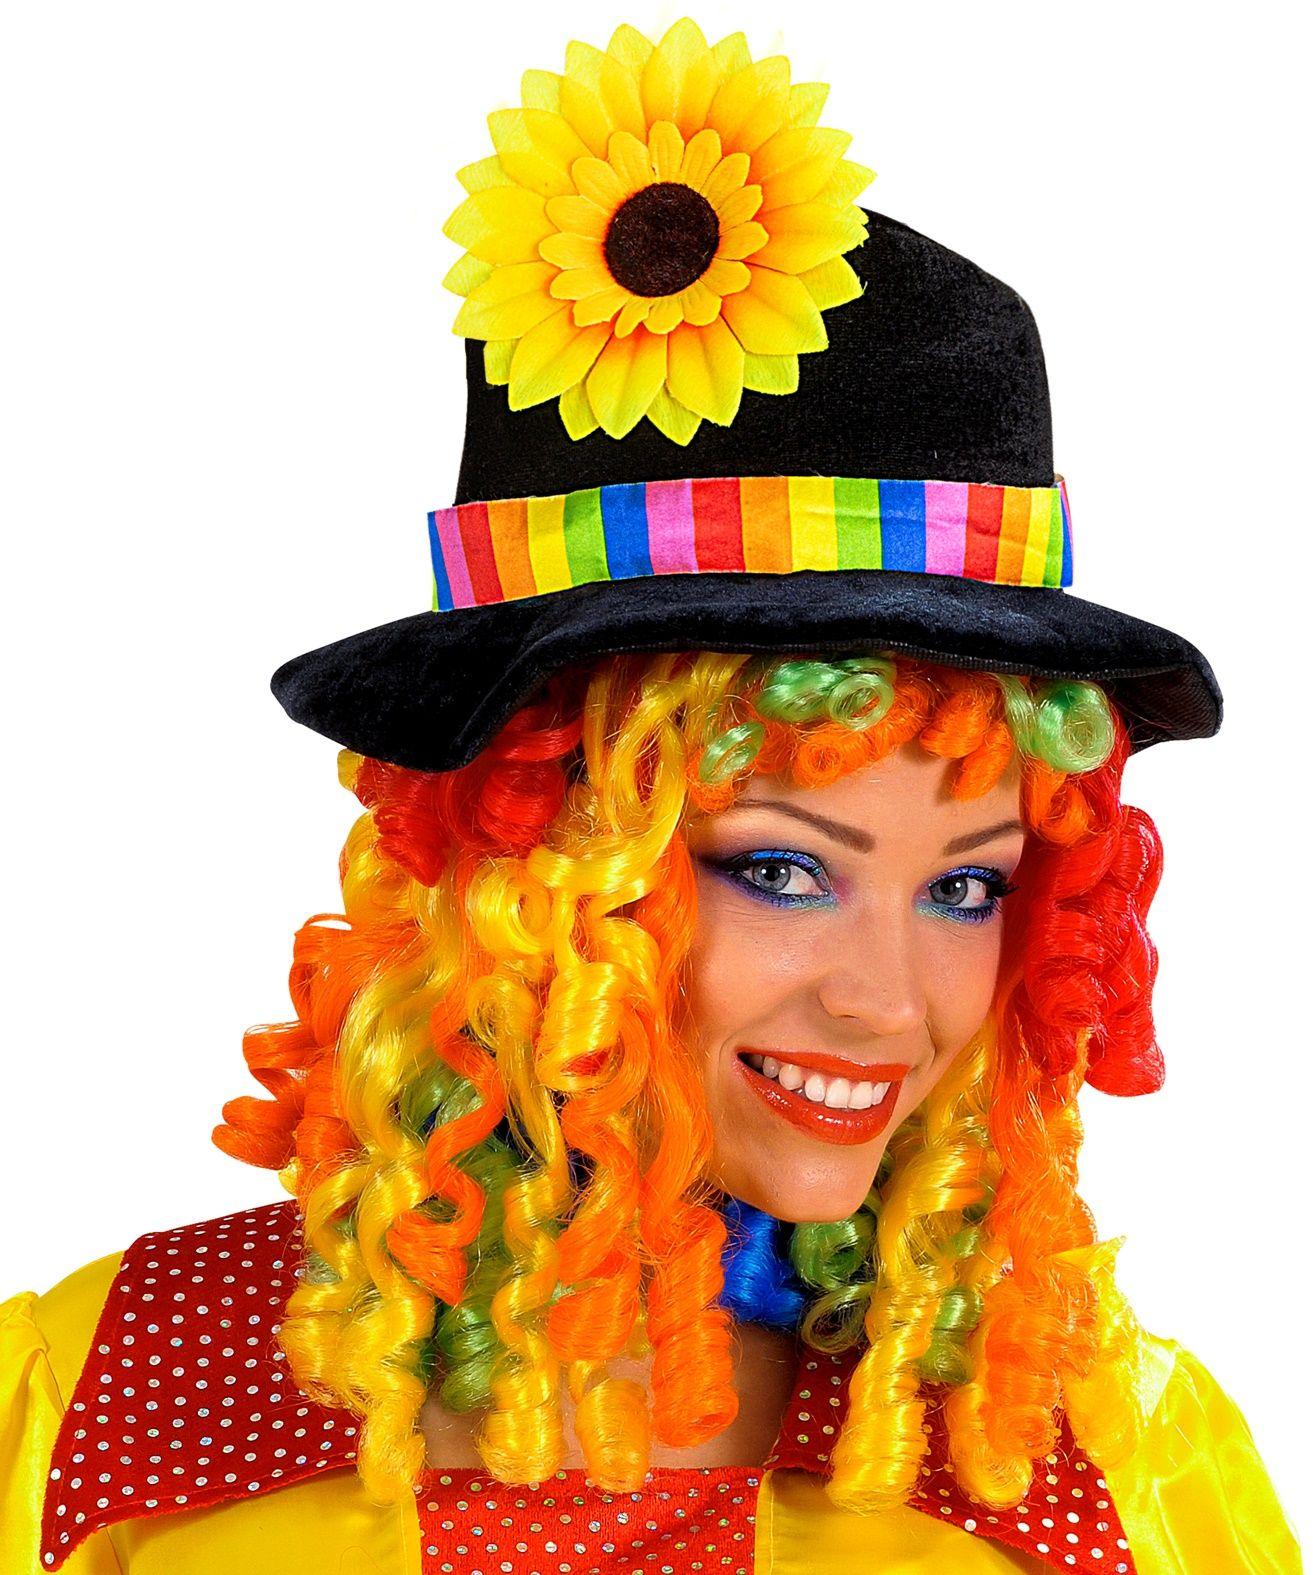 Clownshoed met pruik en zonnebloem